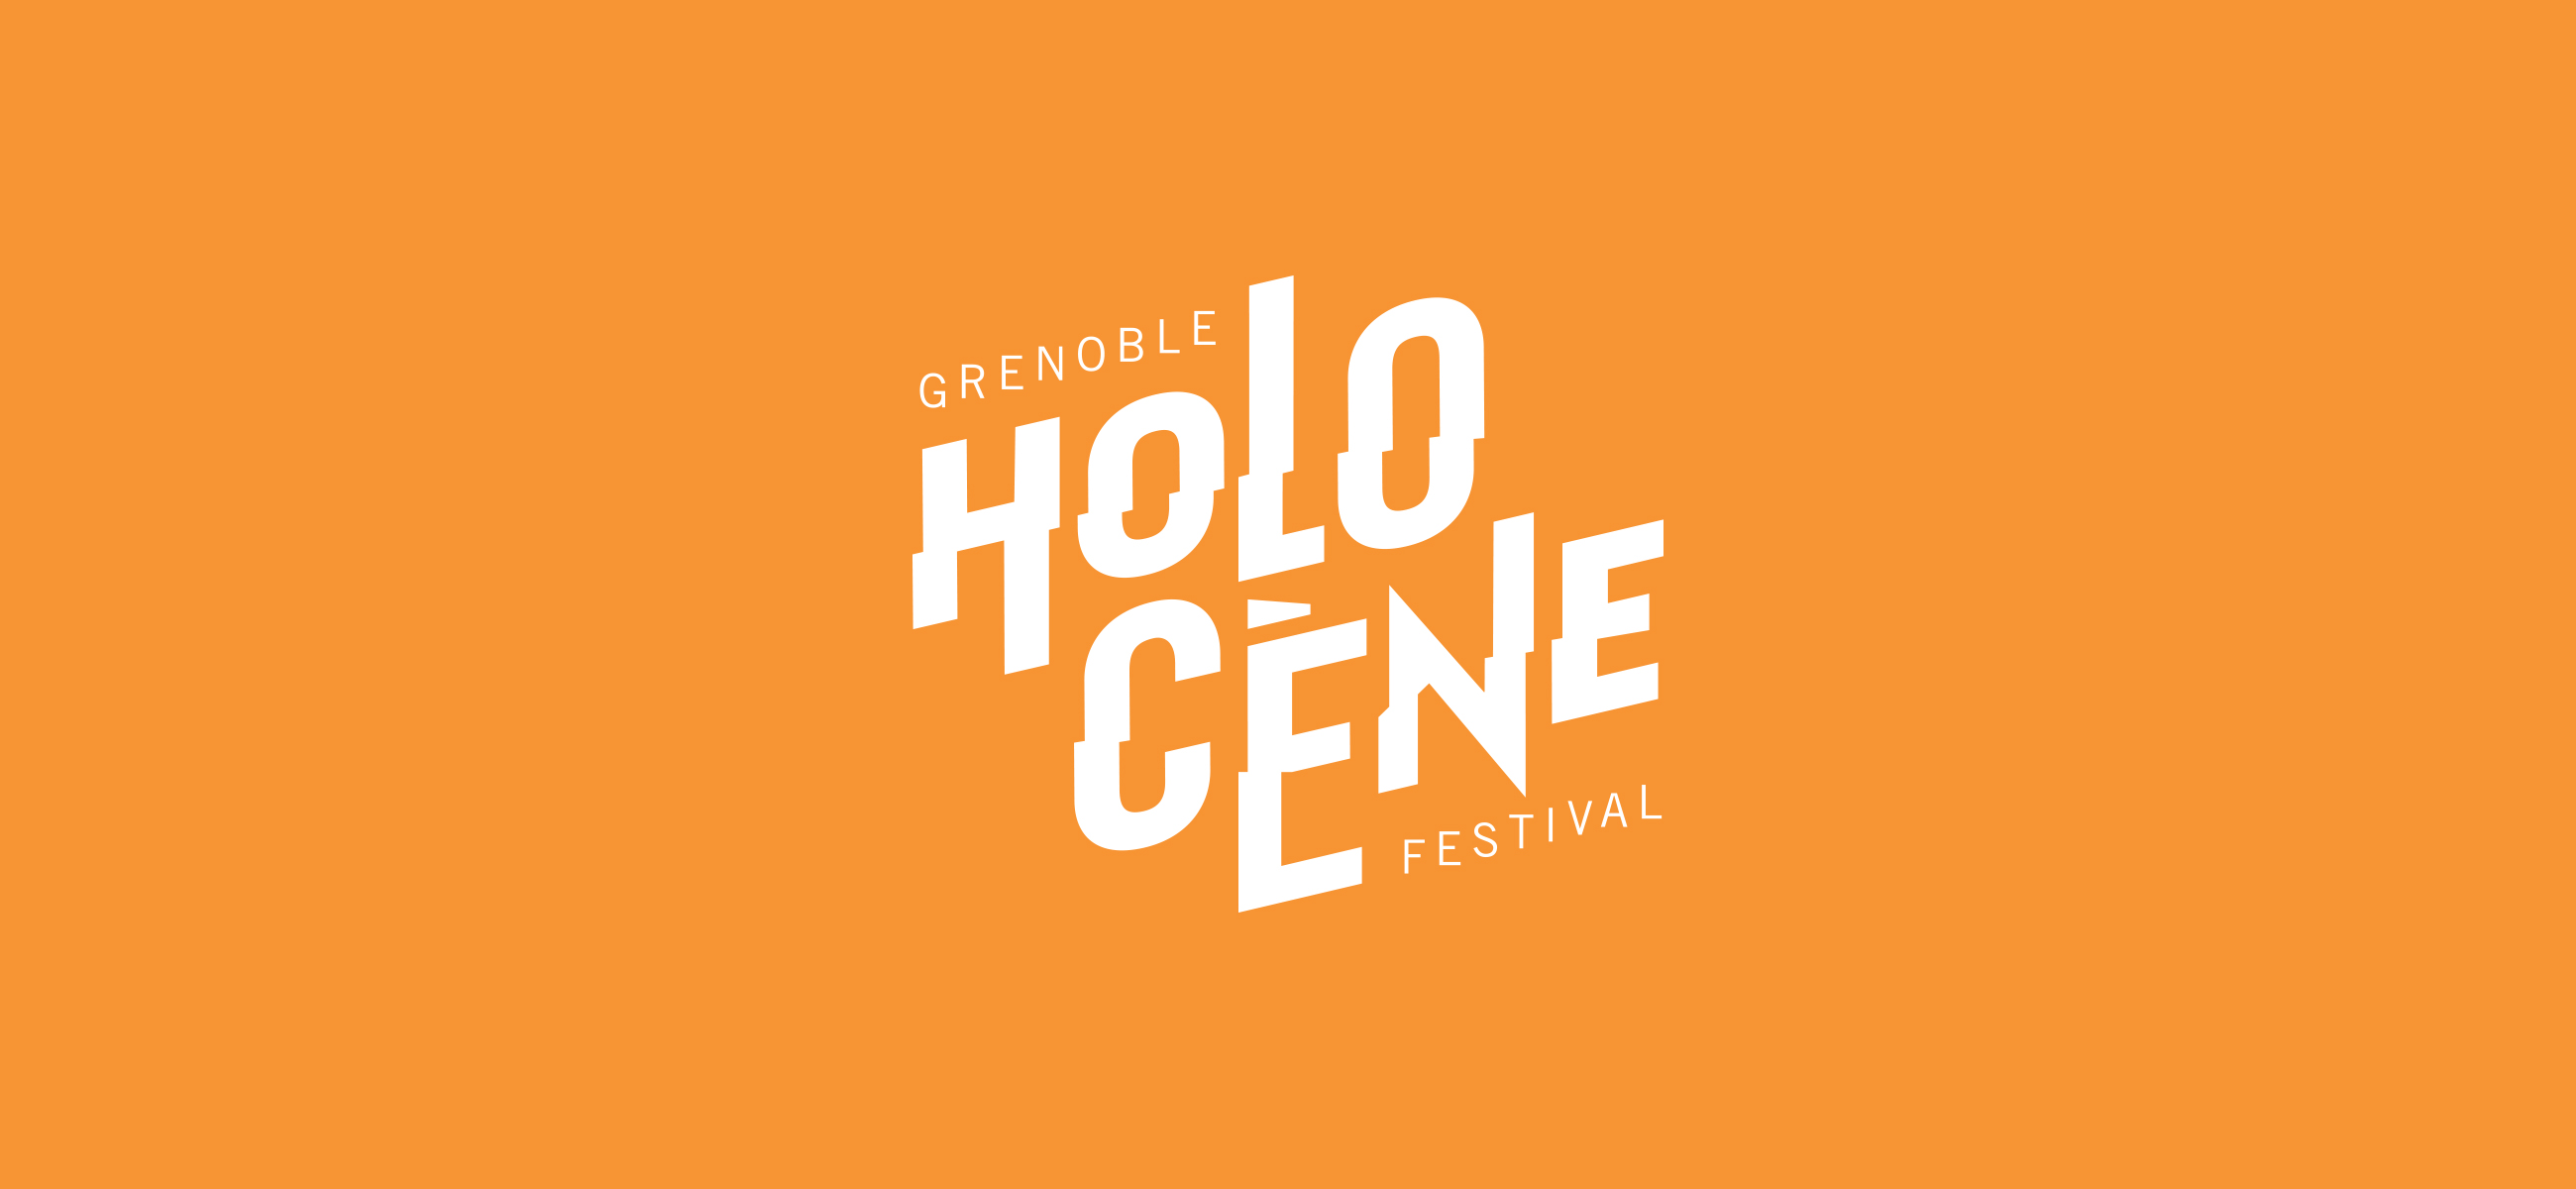 holocene_02_parallele_graphique